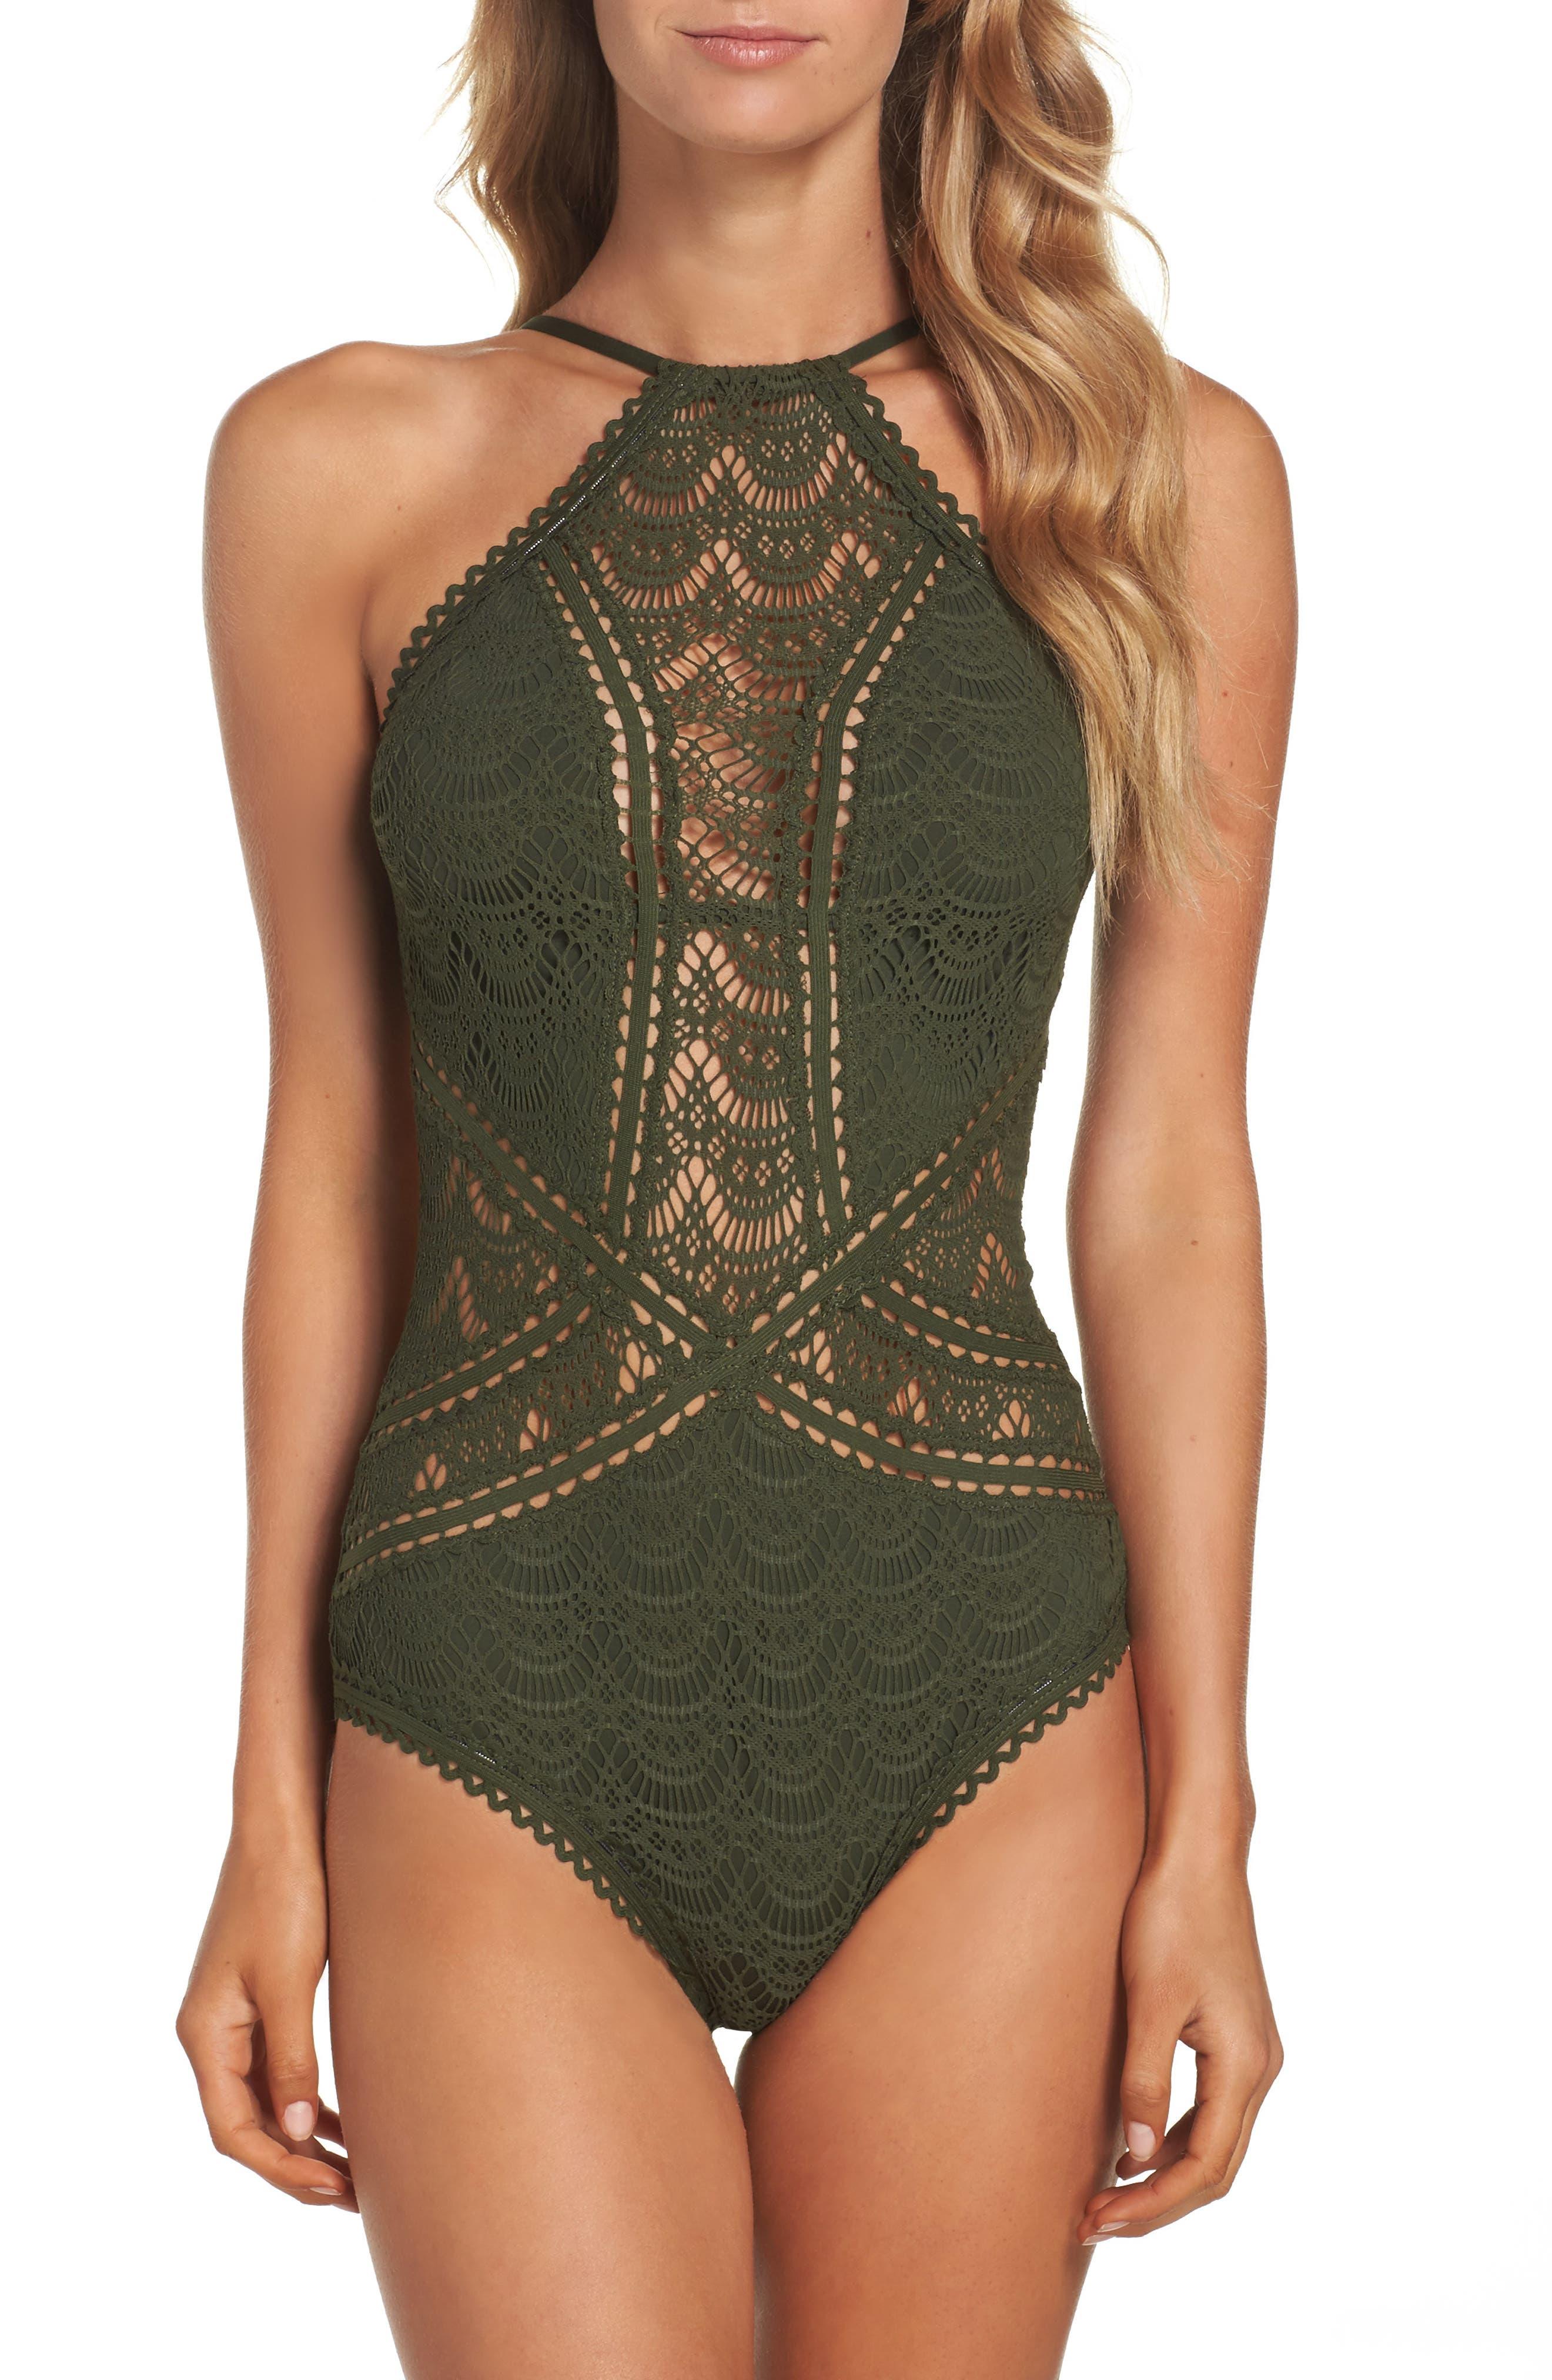 Alternate Image 1 Selected - Becca Crochet One-Piece Swimsuit